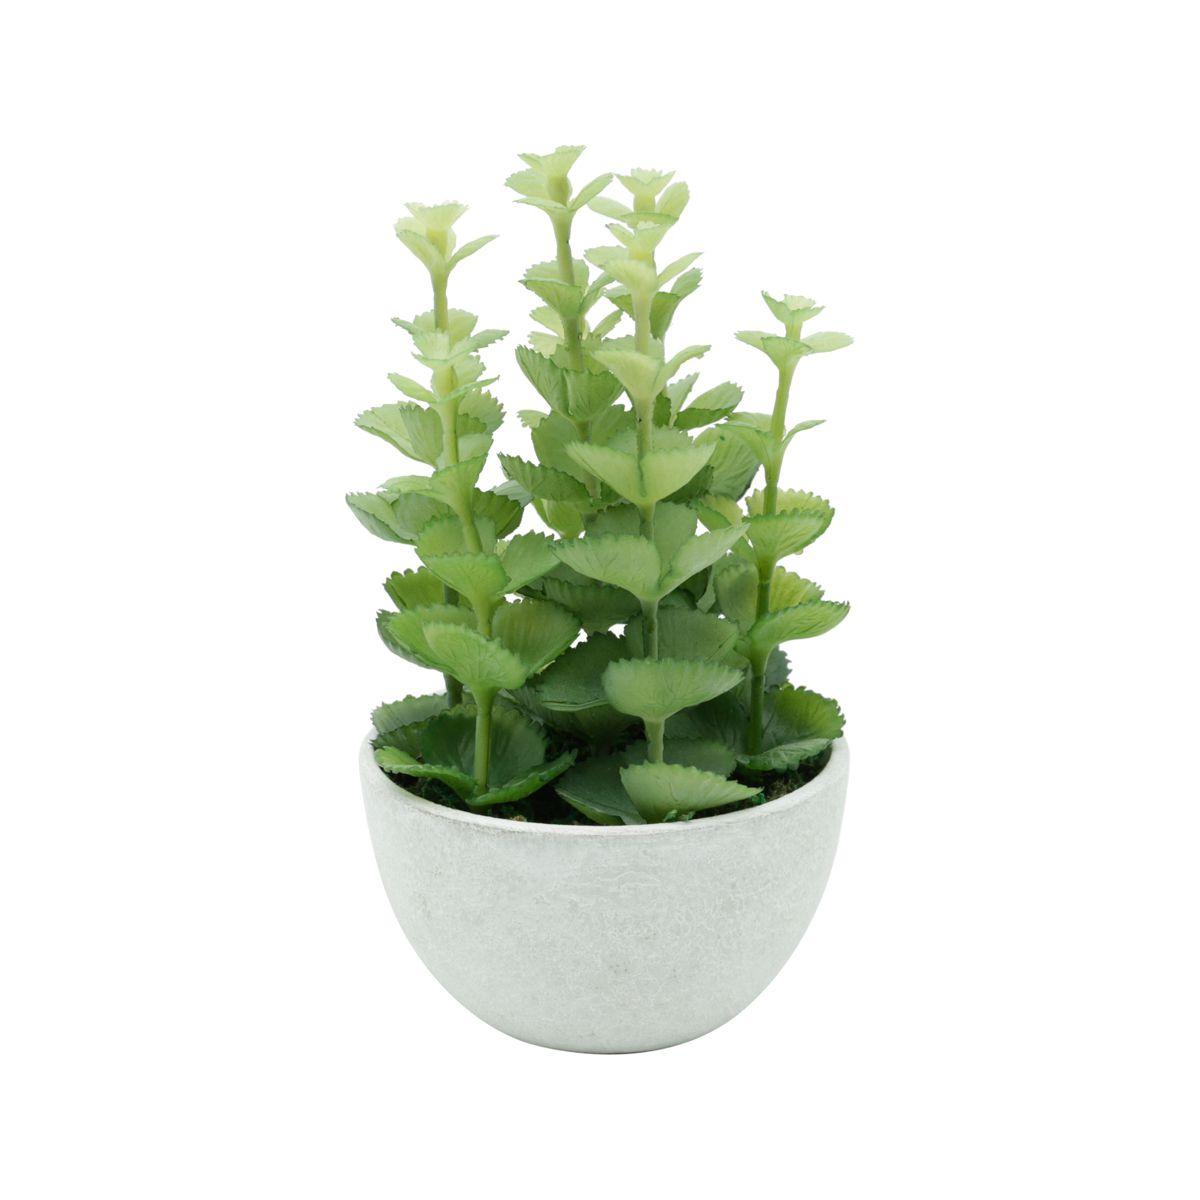 Vaso Plástico E Metal Crassula Plant Branco E Verde 10,5X10,5X18Cm - Urban